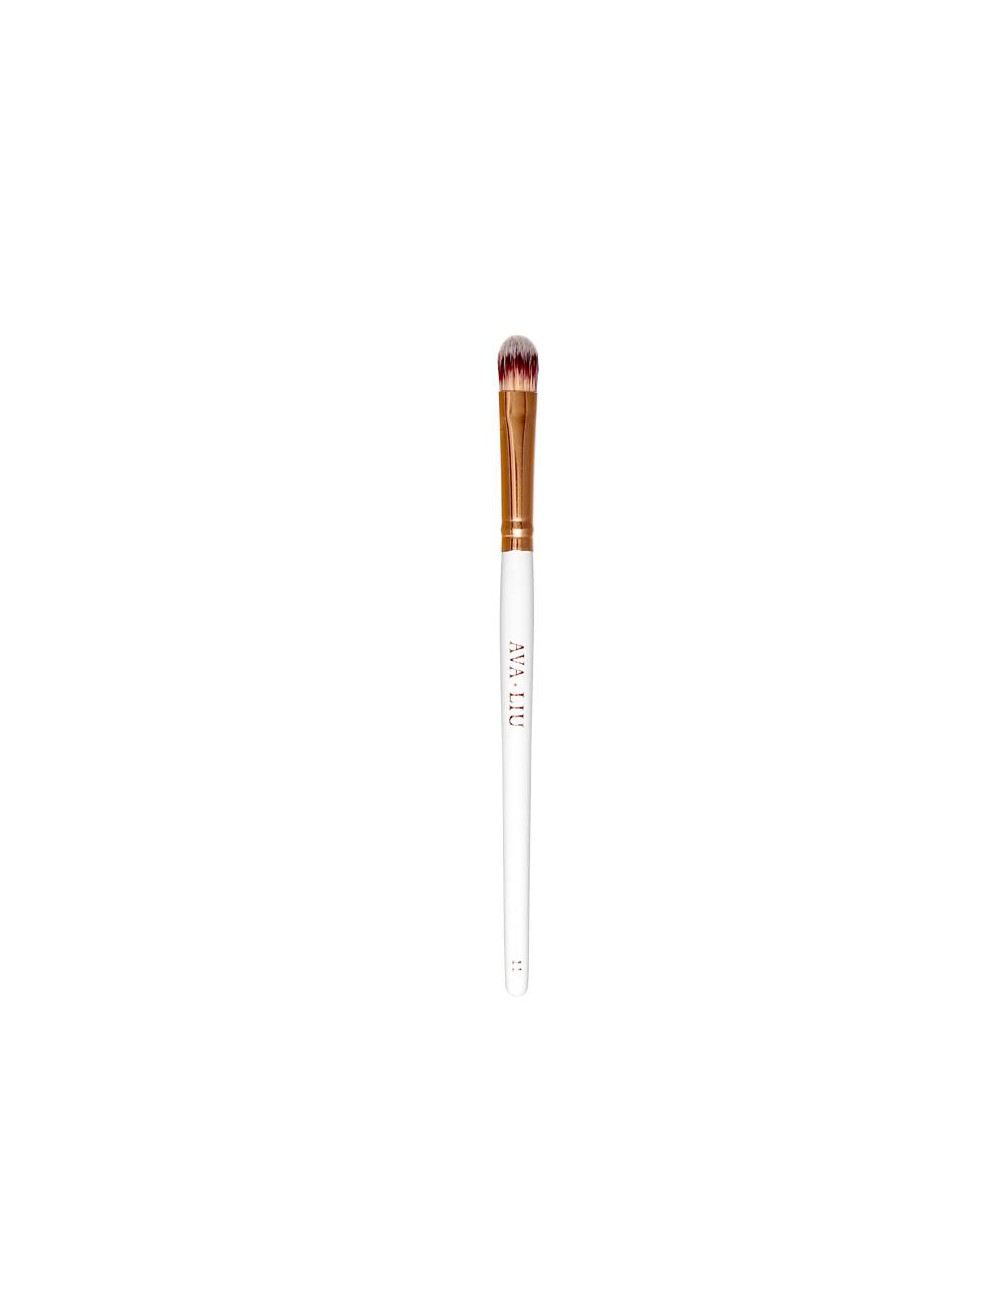 AVA.LIU Flat concealer brush - no.11